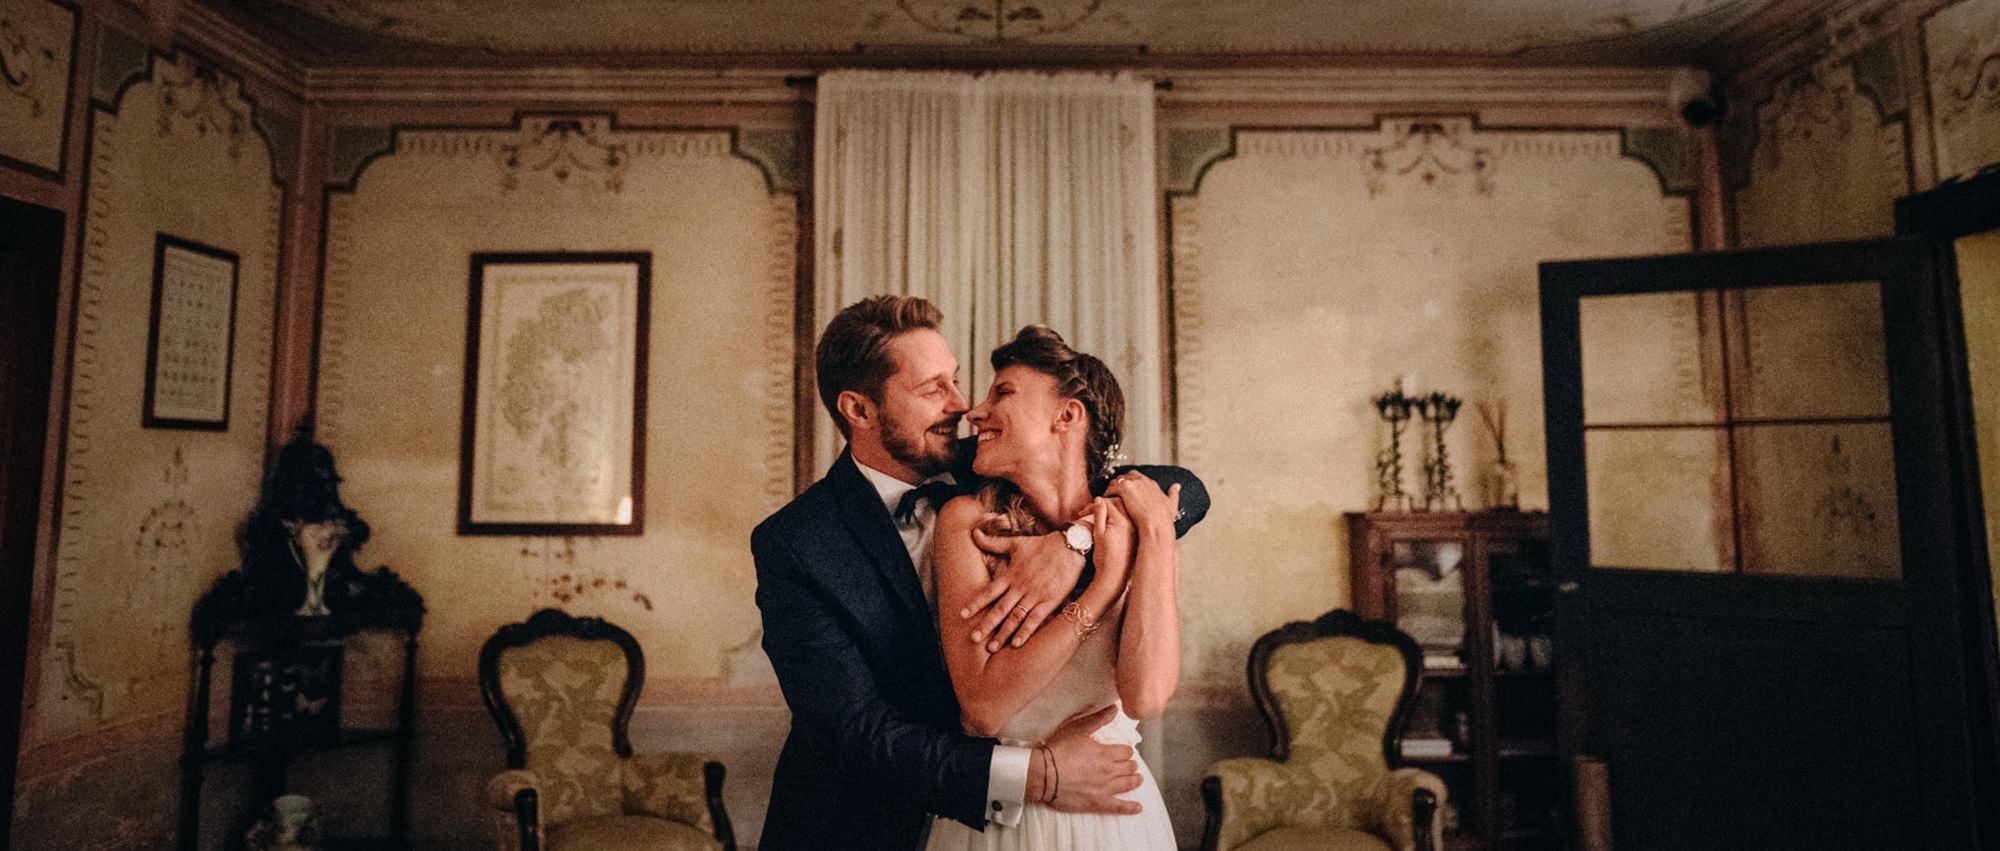 vintage wedding italy 001 - S + S - Vintage Italian Wedding